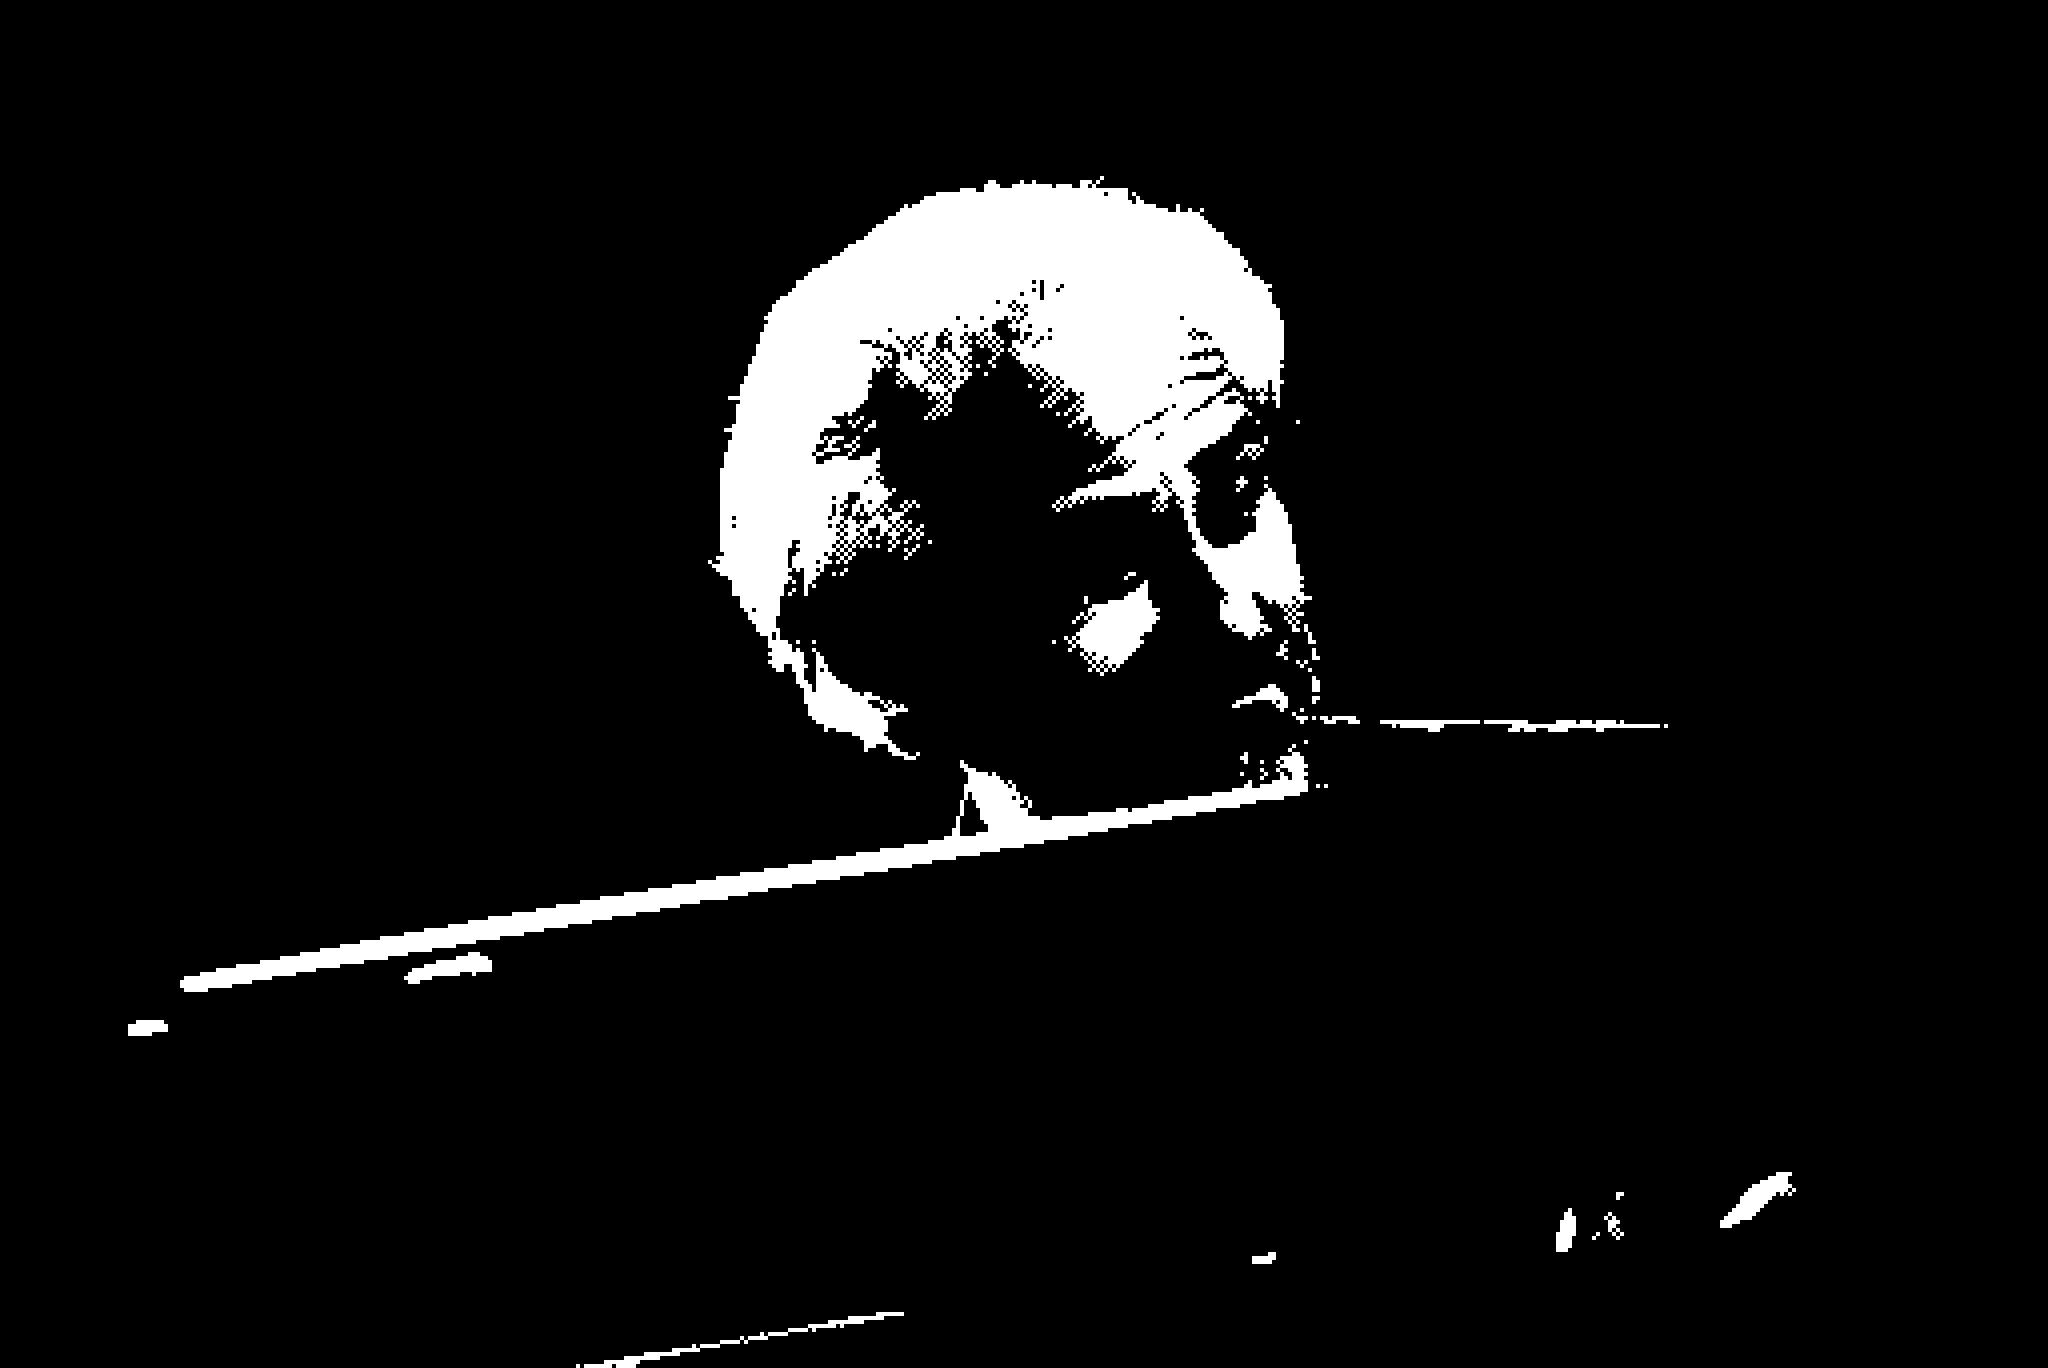 Daylight Music - 8-bit special